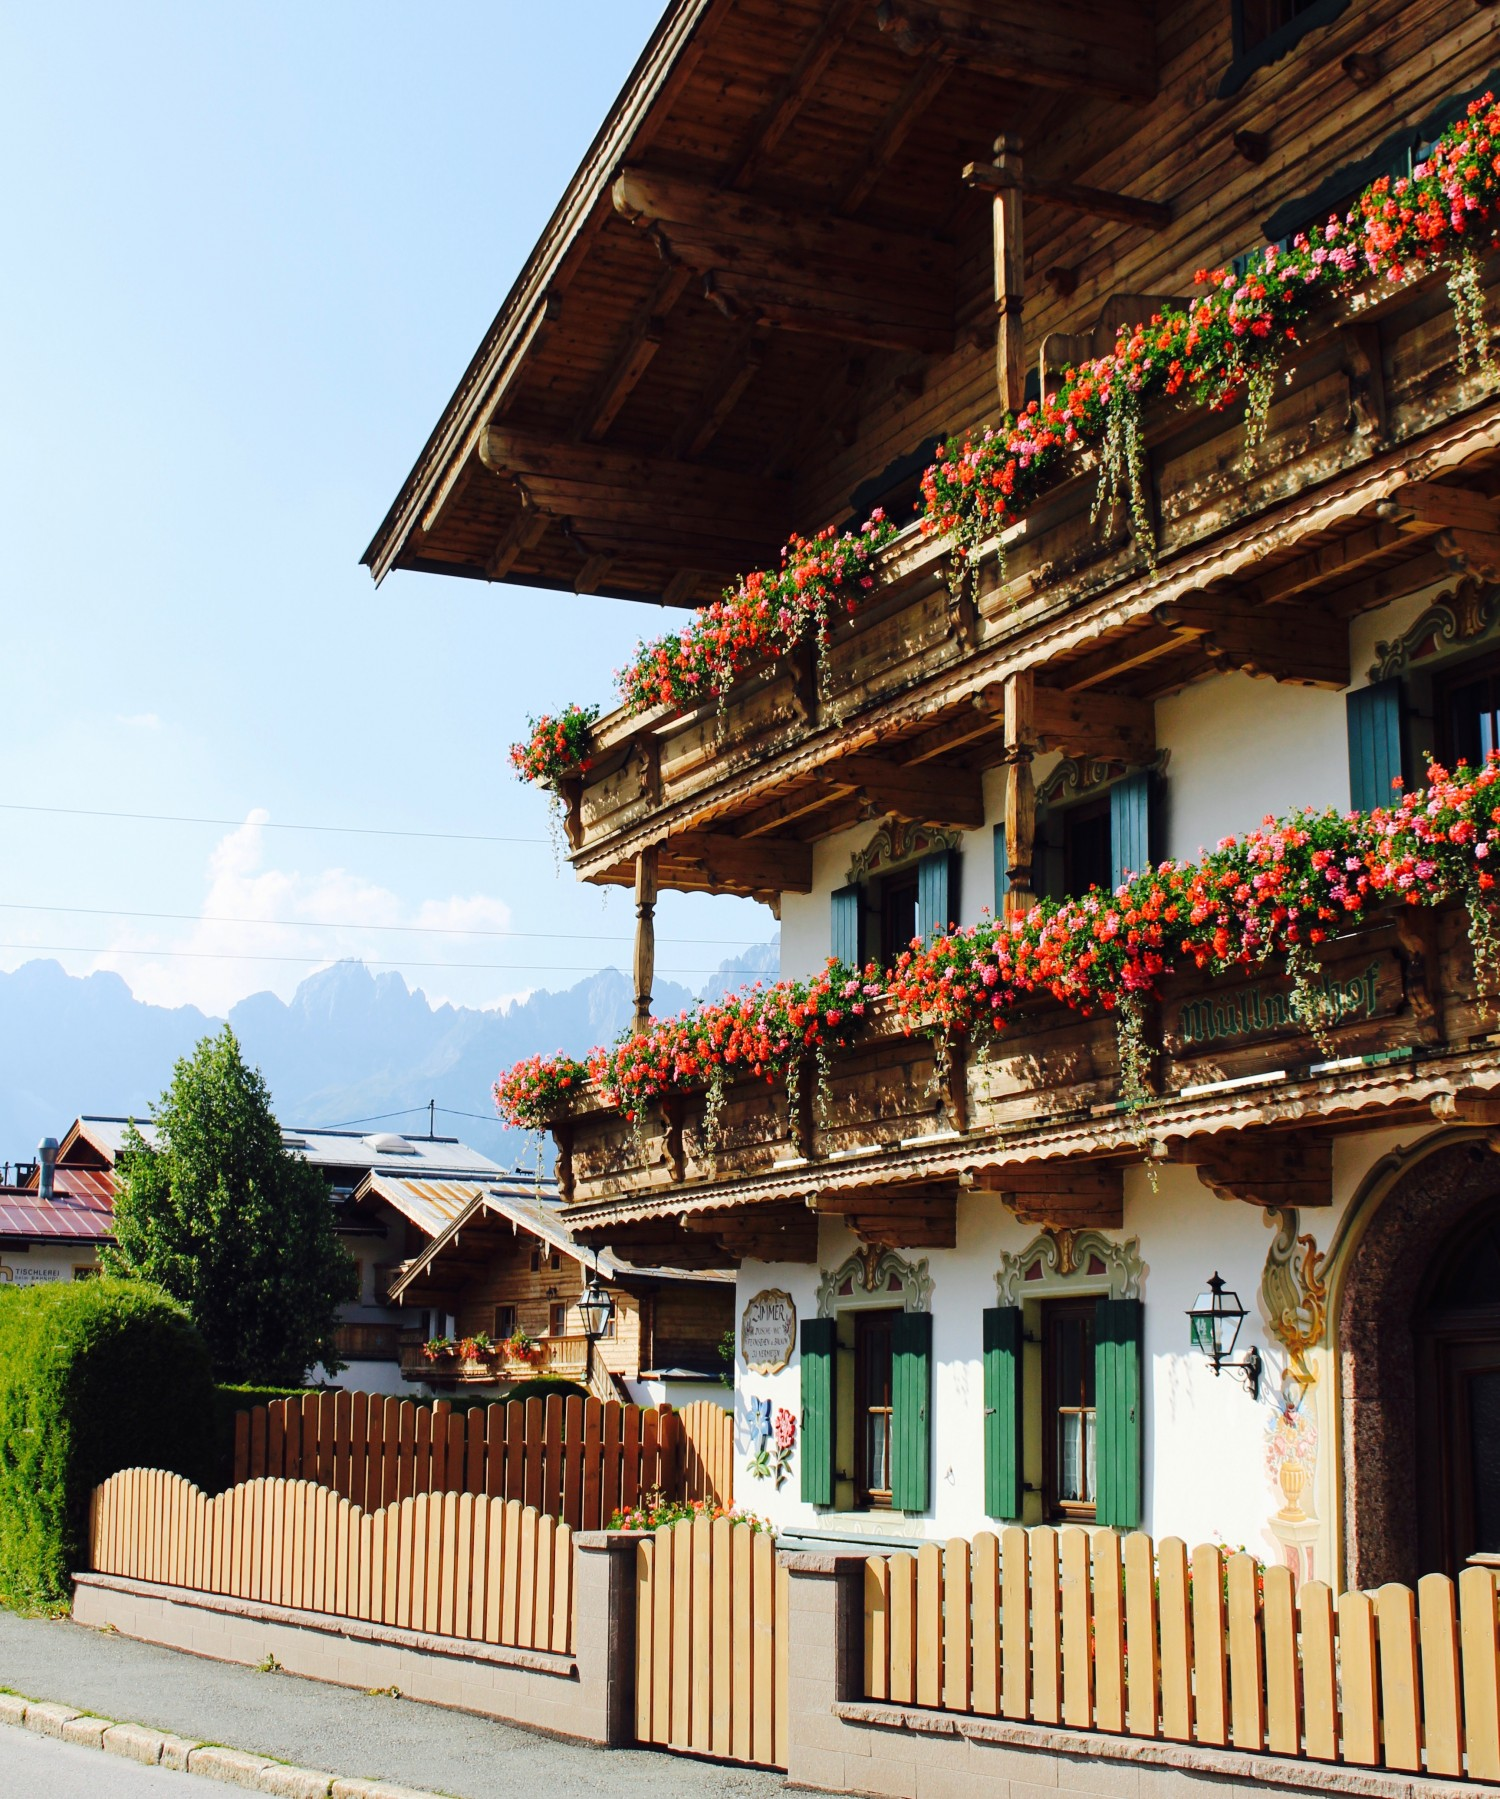 penzinghof-hotel-ostrig-annemette-voss9